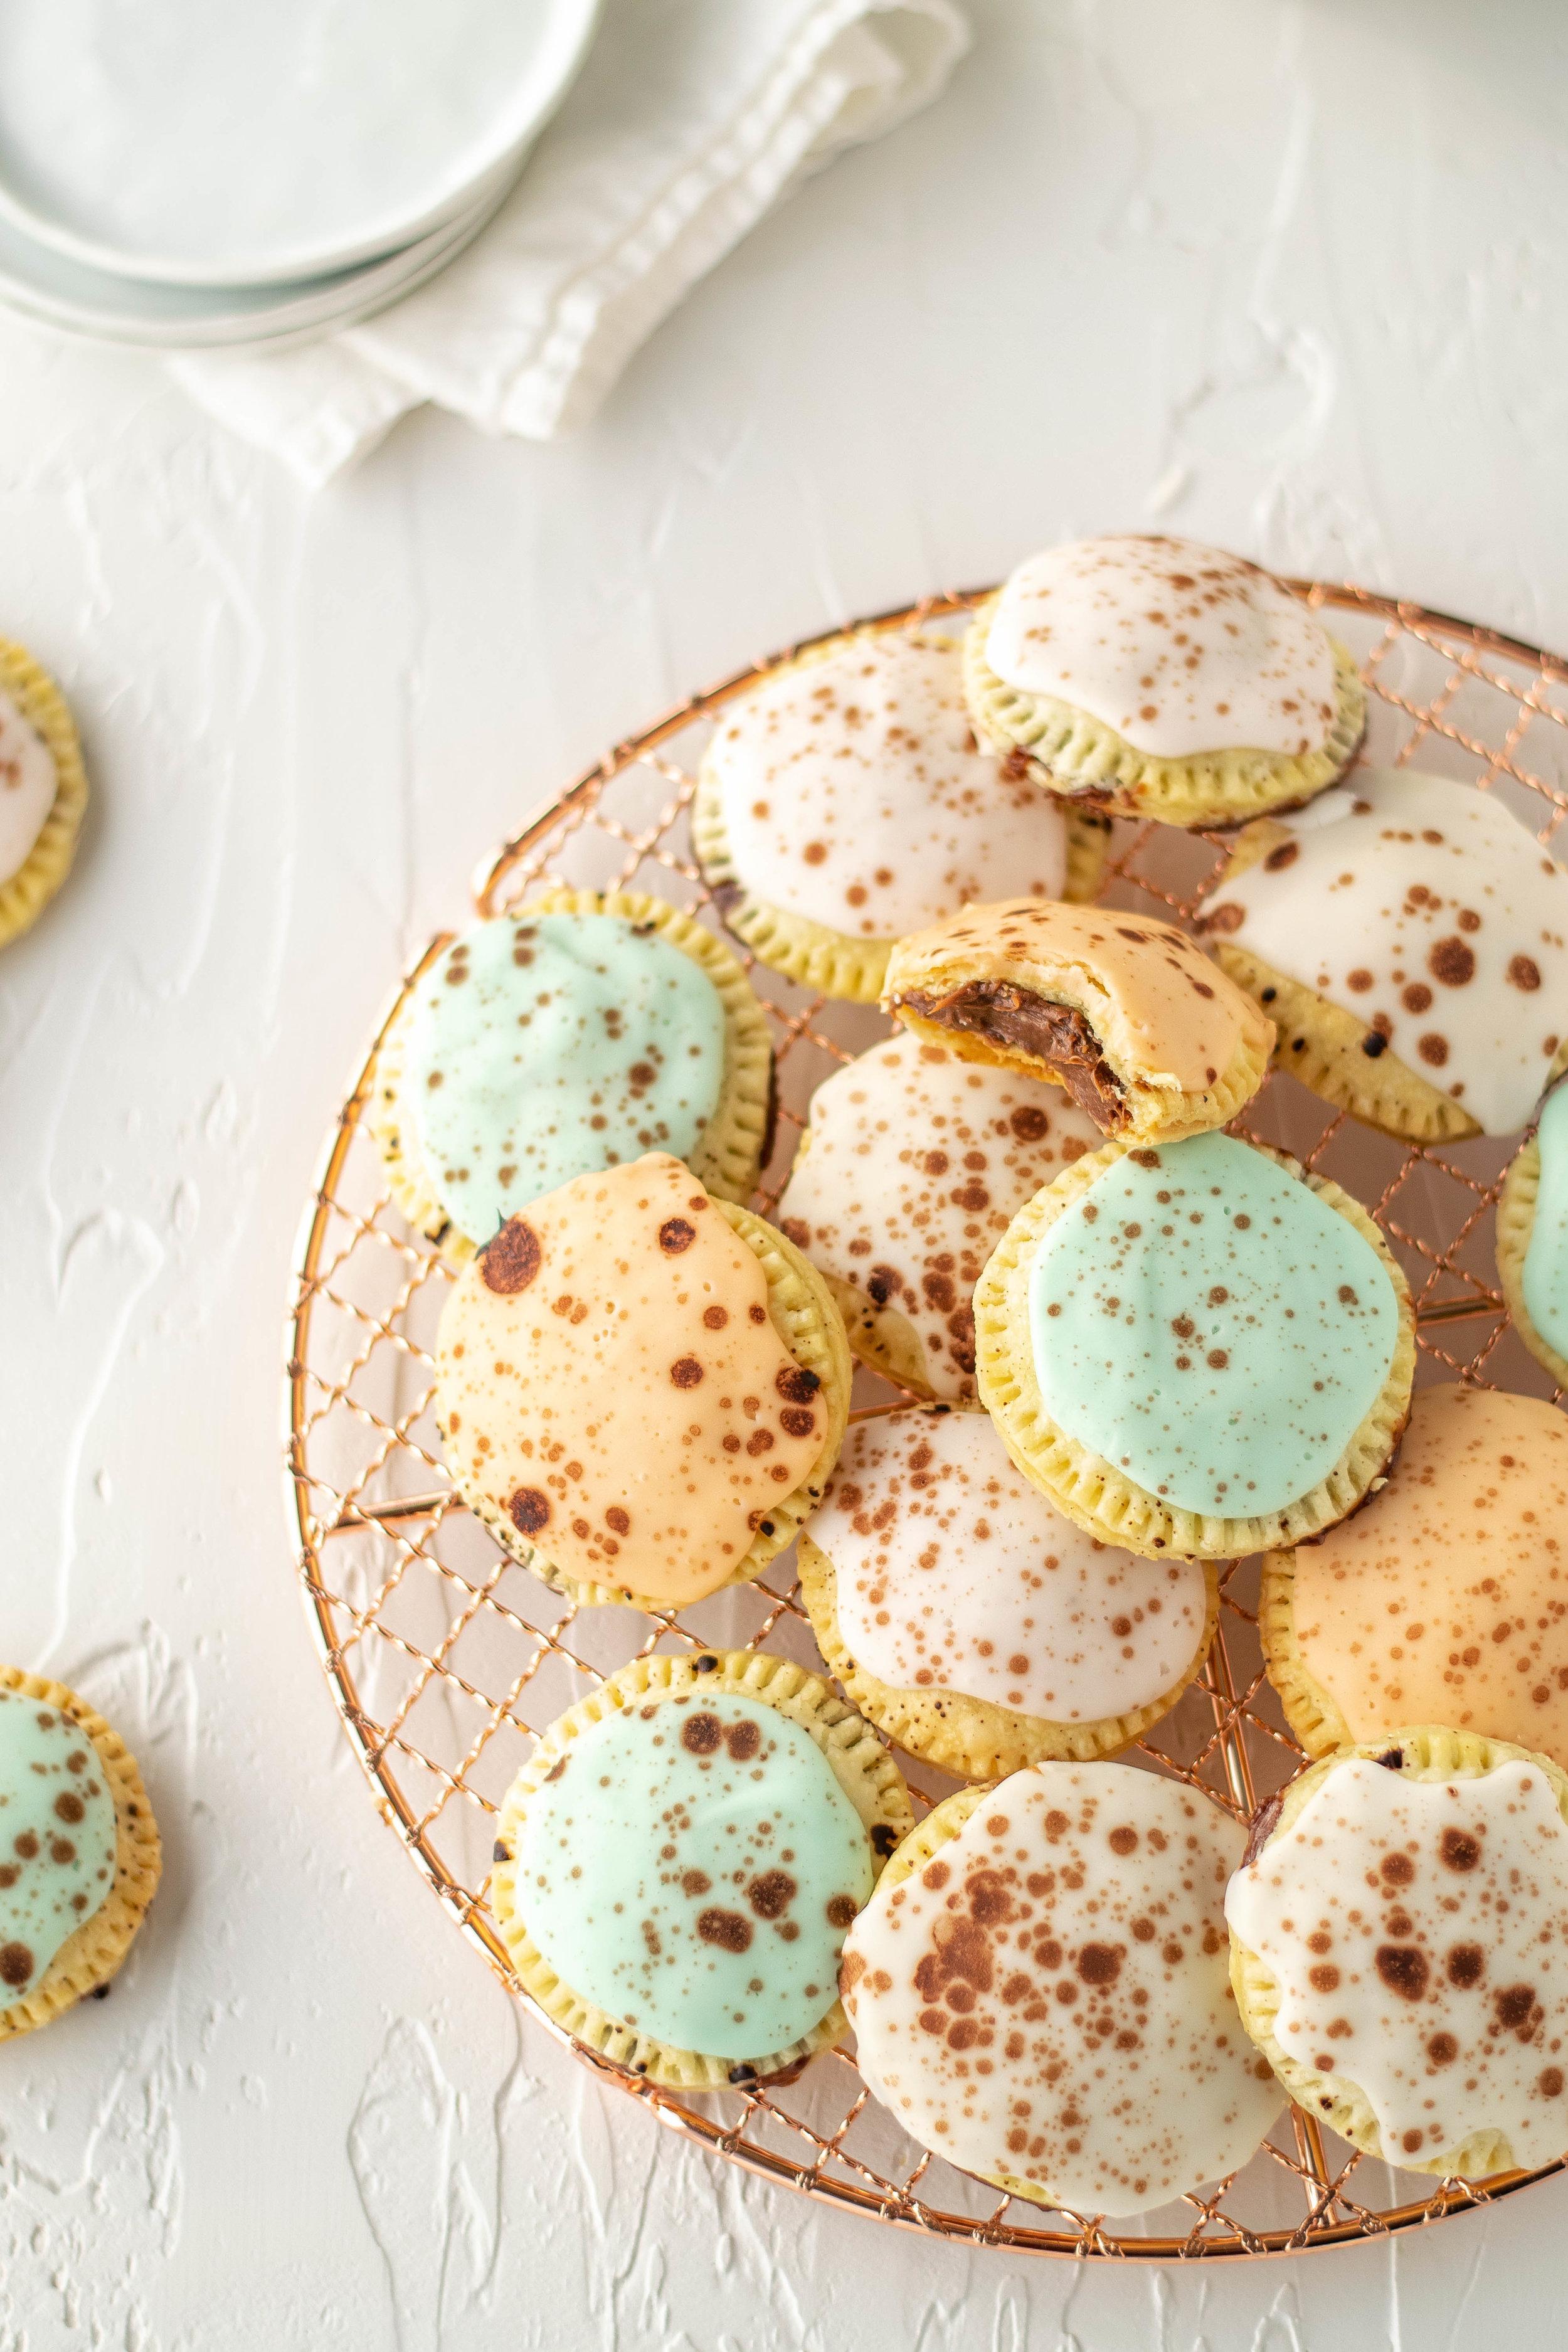 Malted Milk Chocolate Robin's Egg Pop Tarts | All Purpose Flour Child